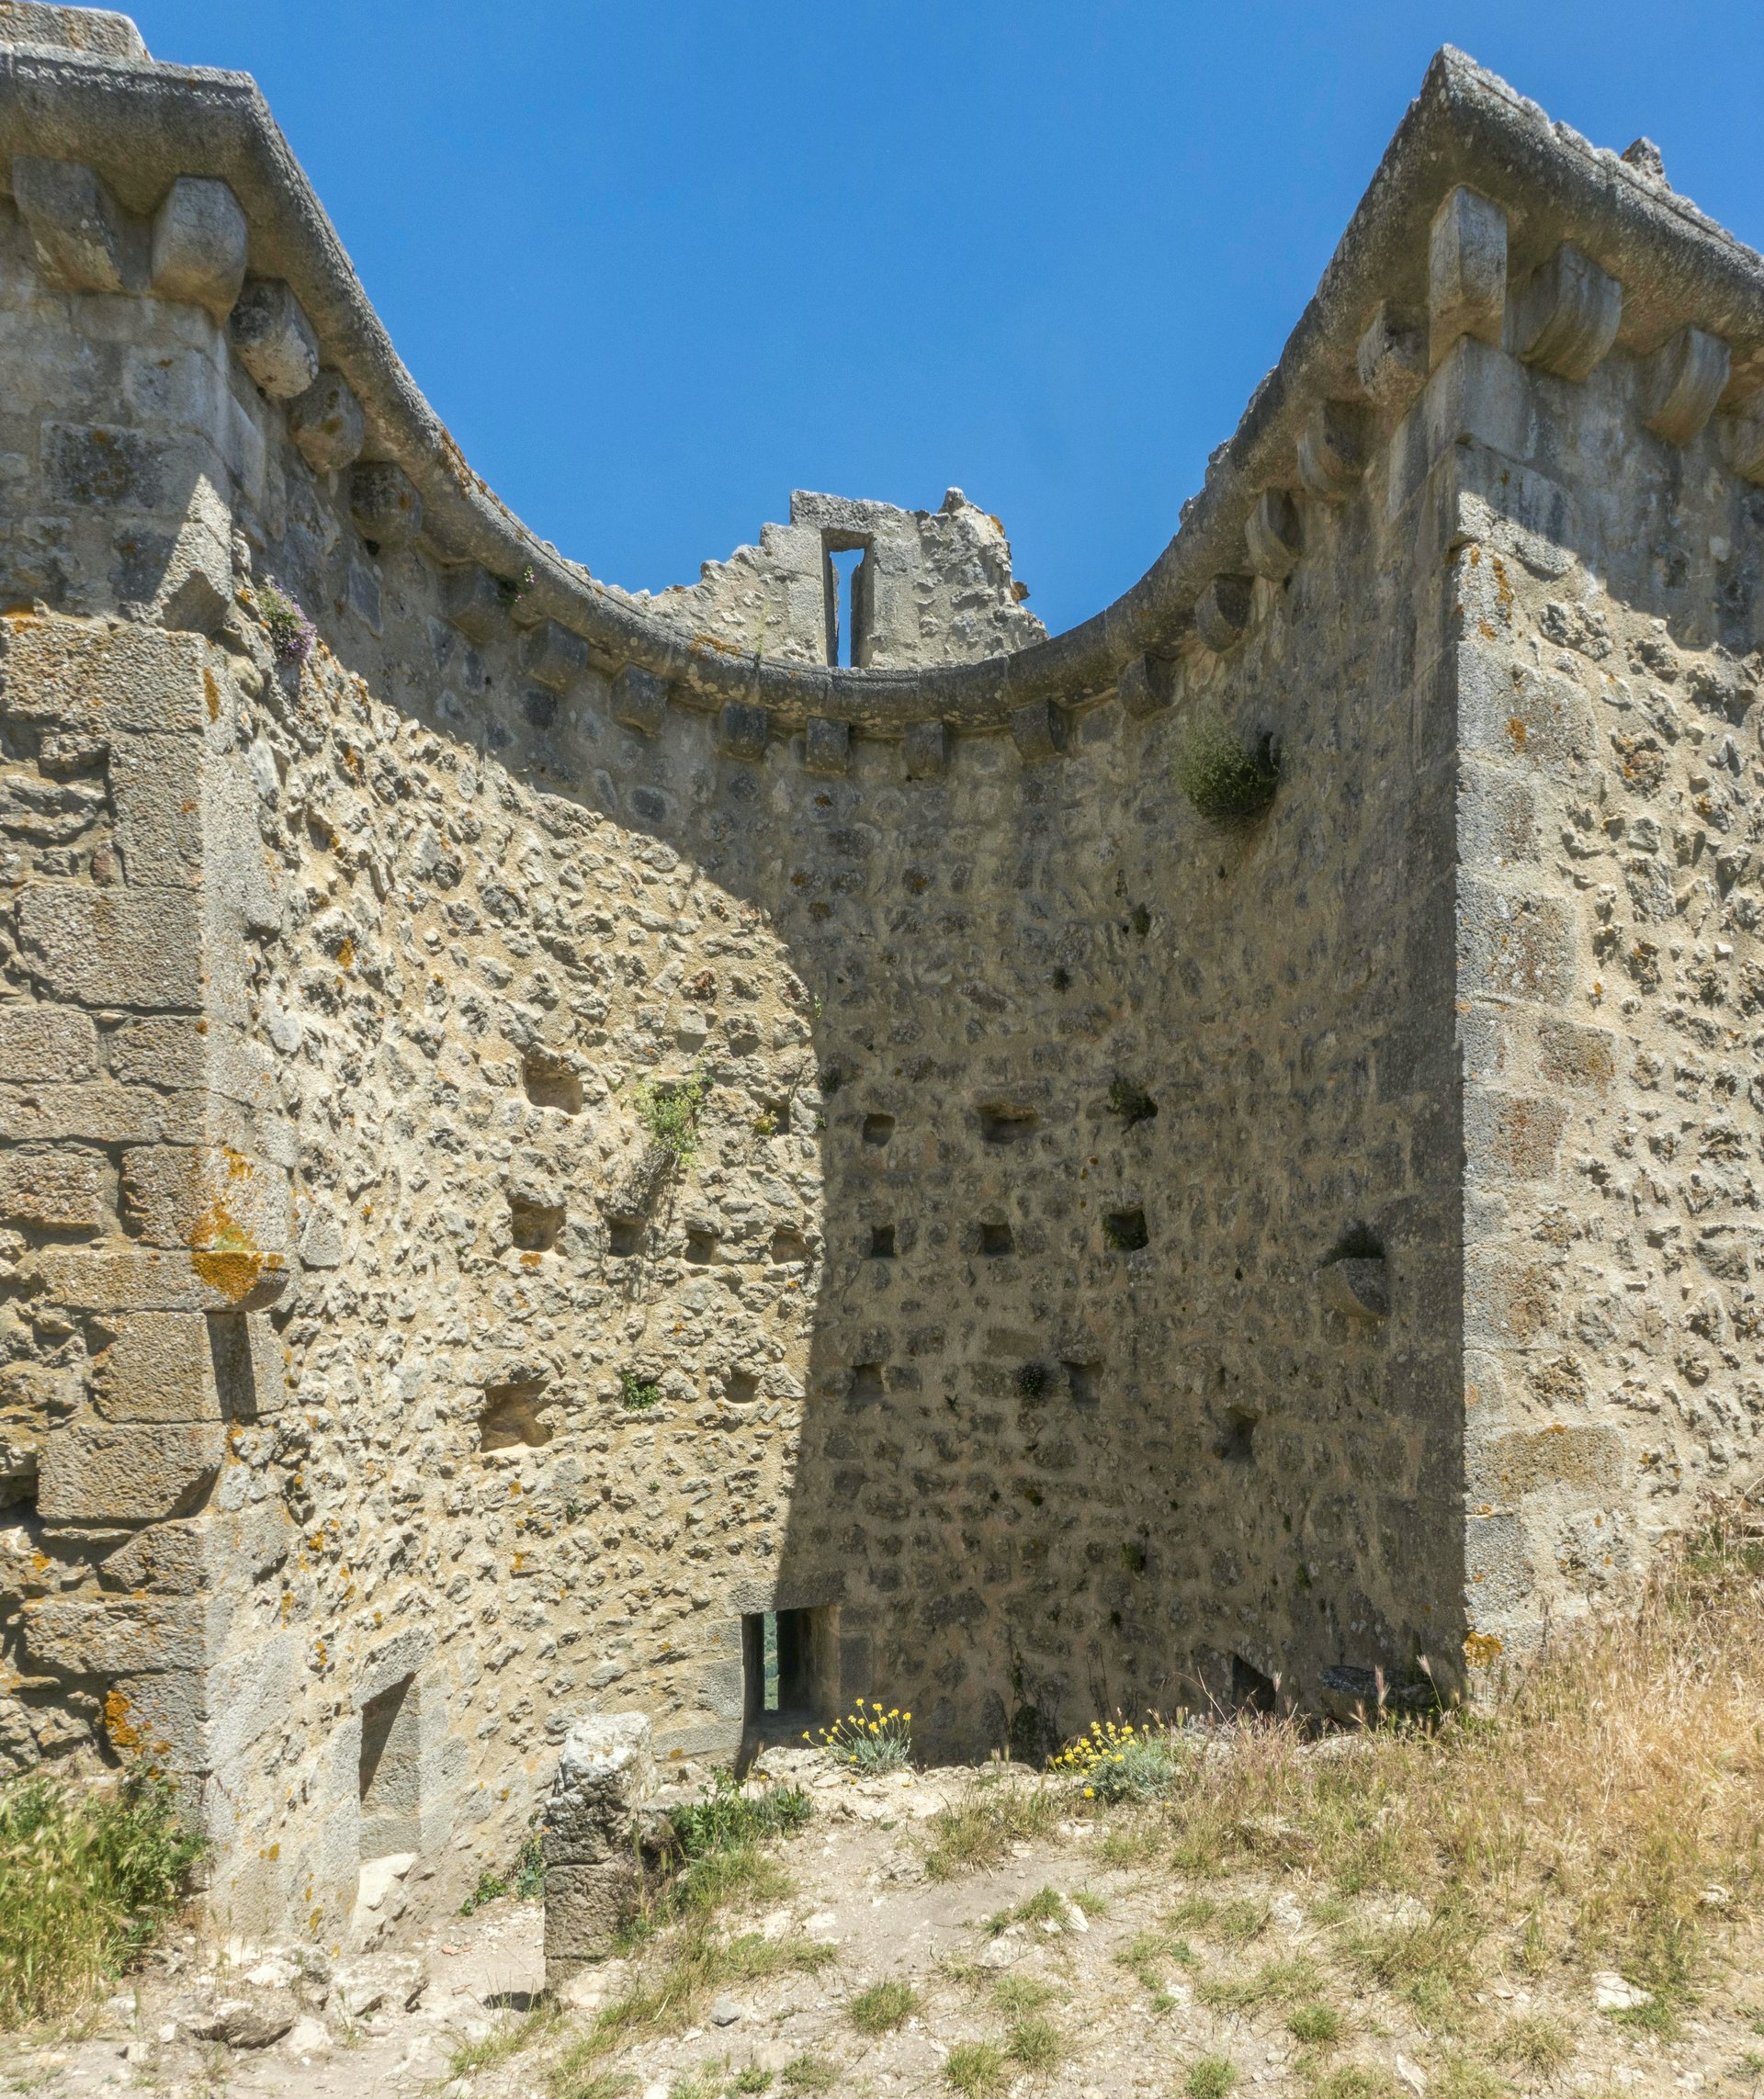 Turm der ersten Ringmauer vom Château de Peyrepertuse